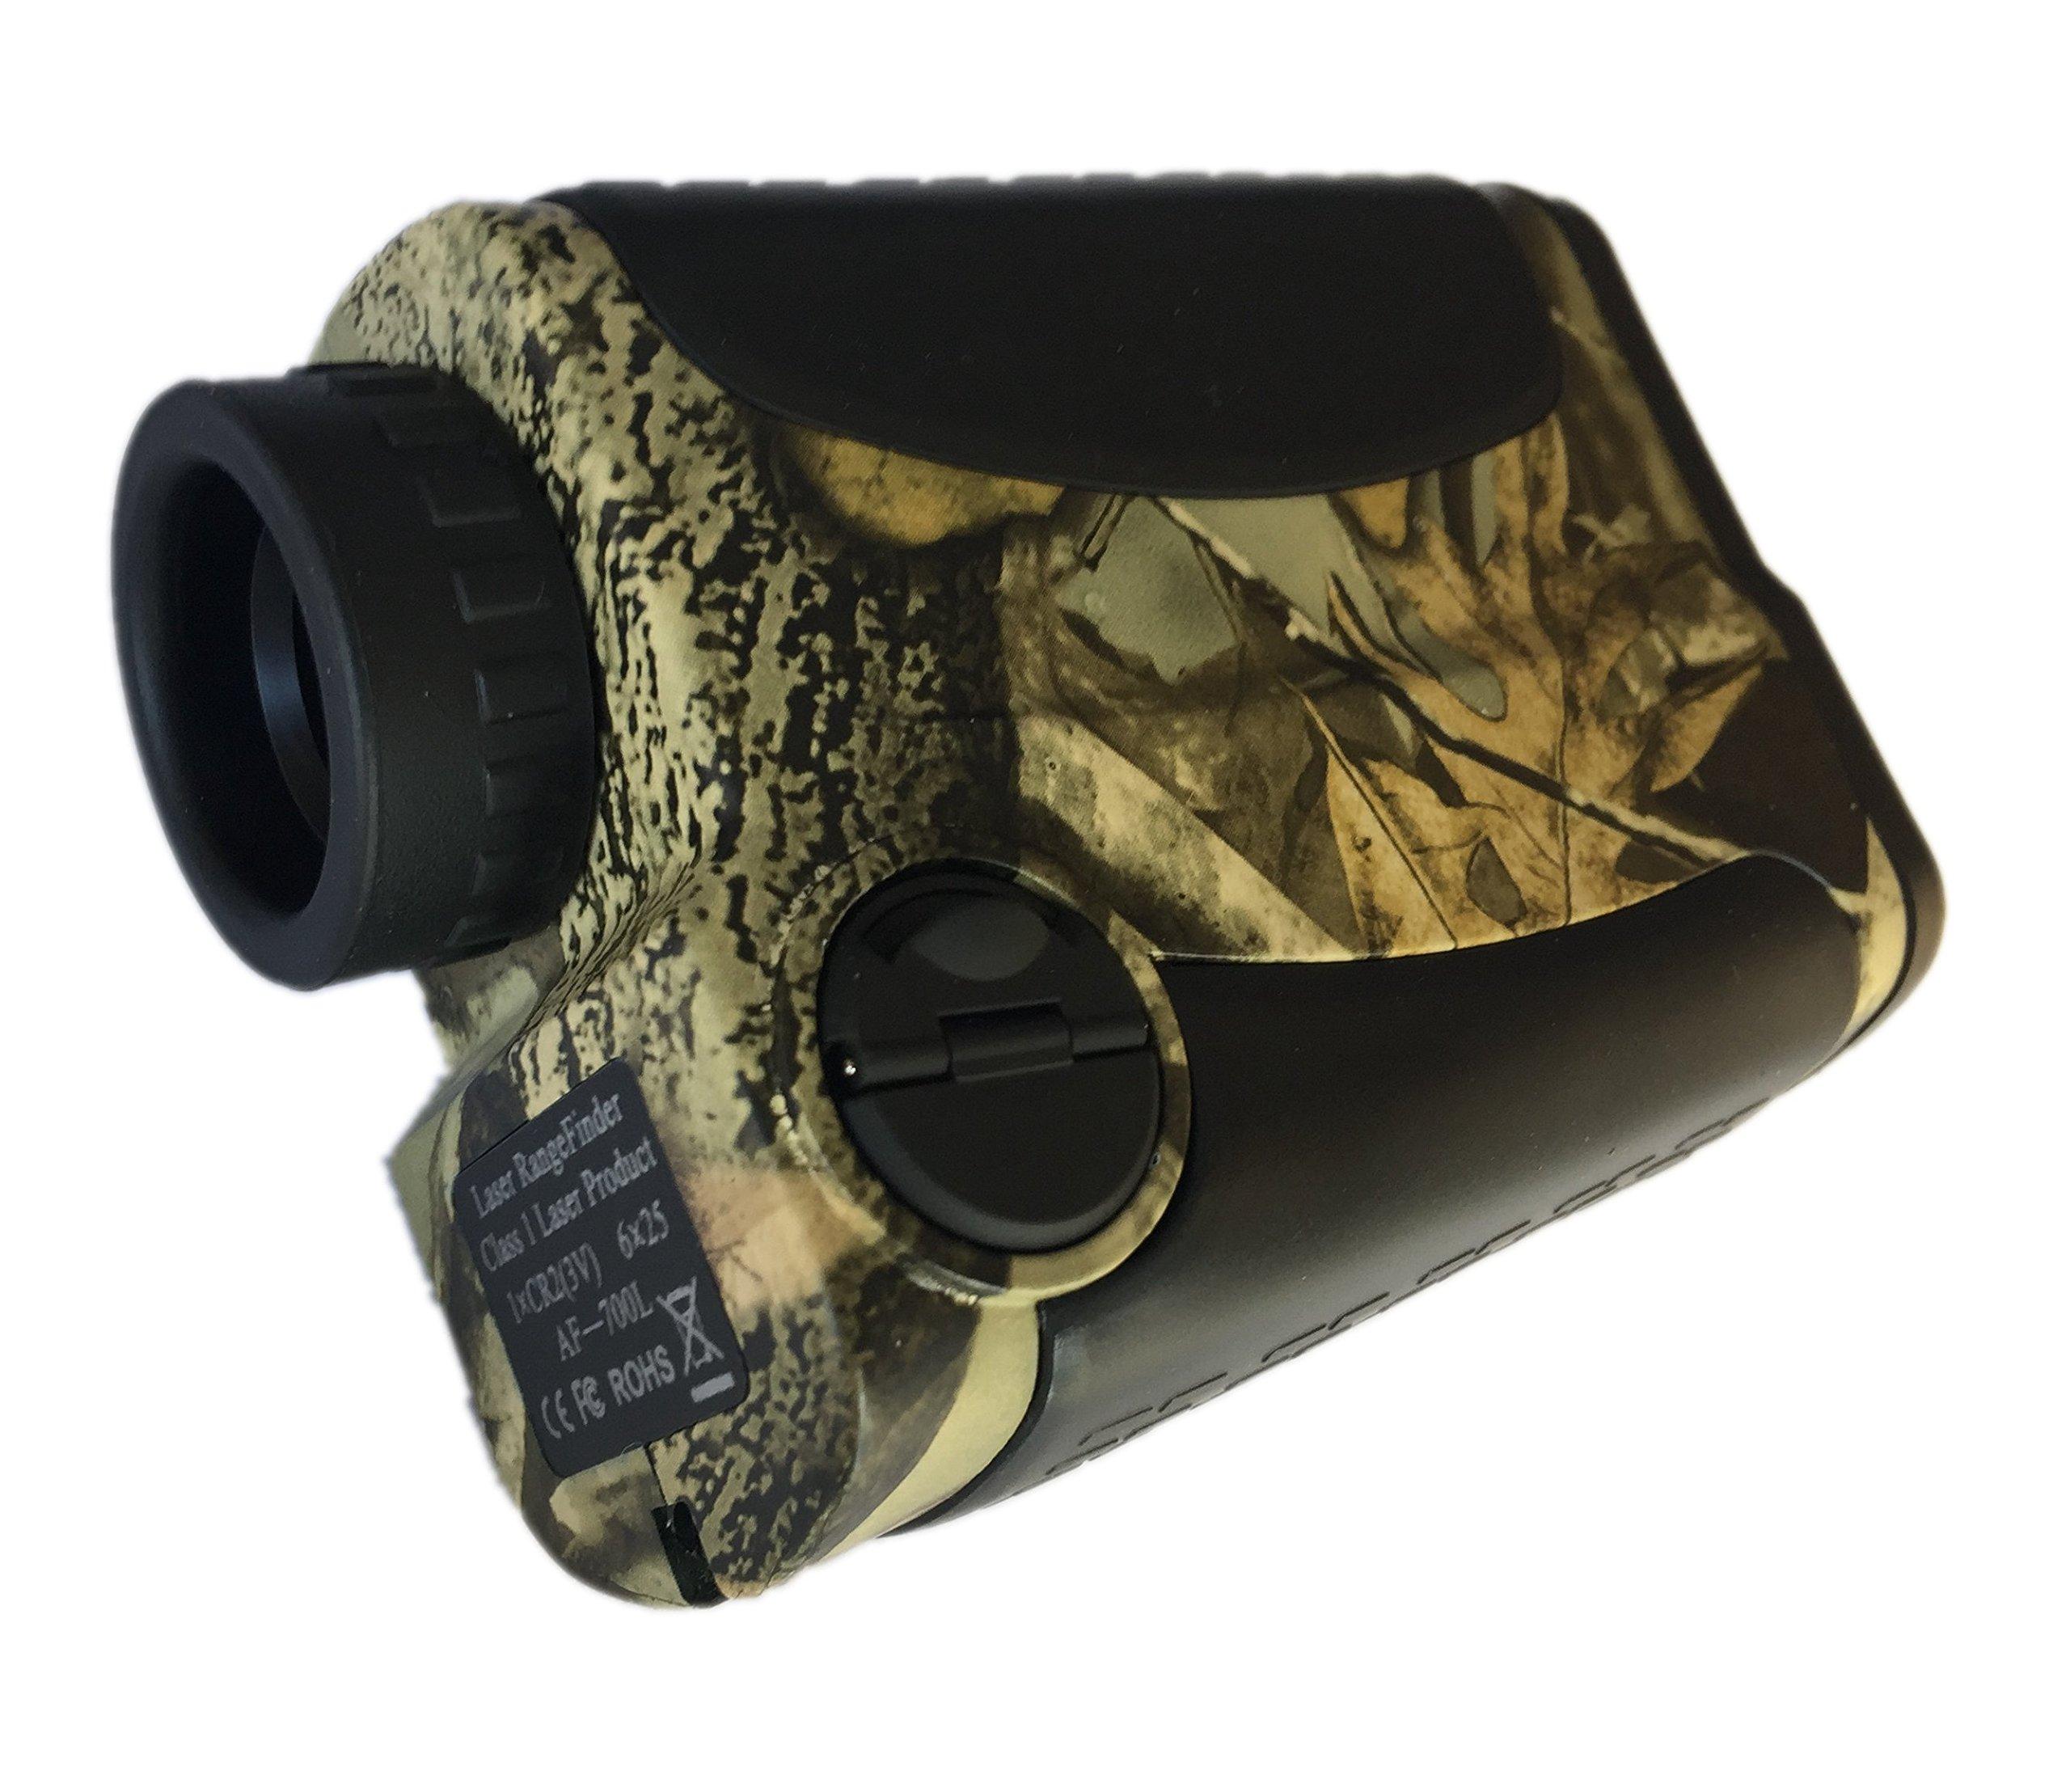 Ade Advanced Optics Golf Rangefinder Hunting Range Finder with PinSeeker Laser Binoculars, Camouflage by Ade Advanced Optics (Image #1)